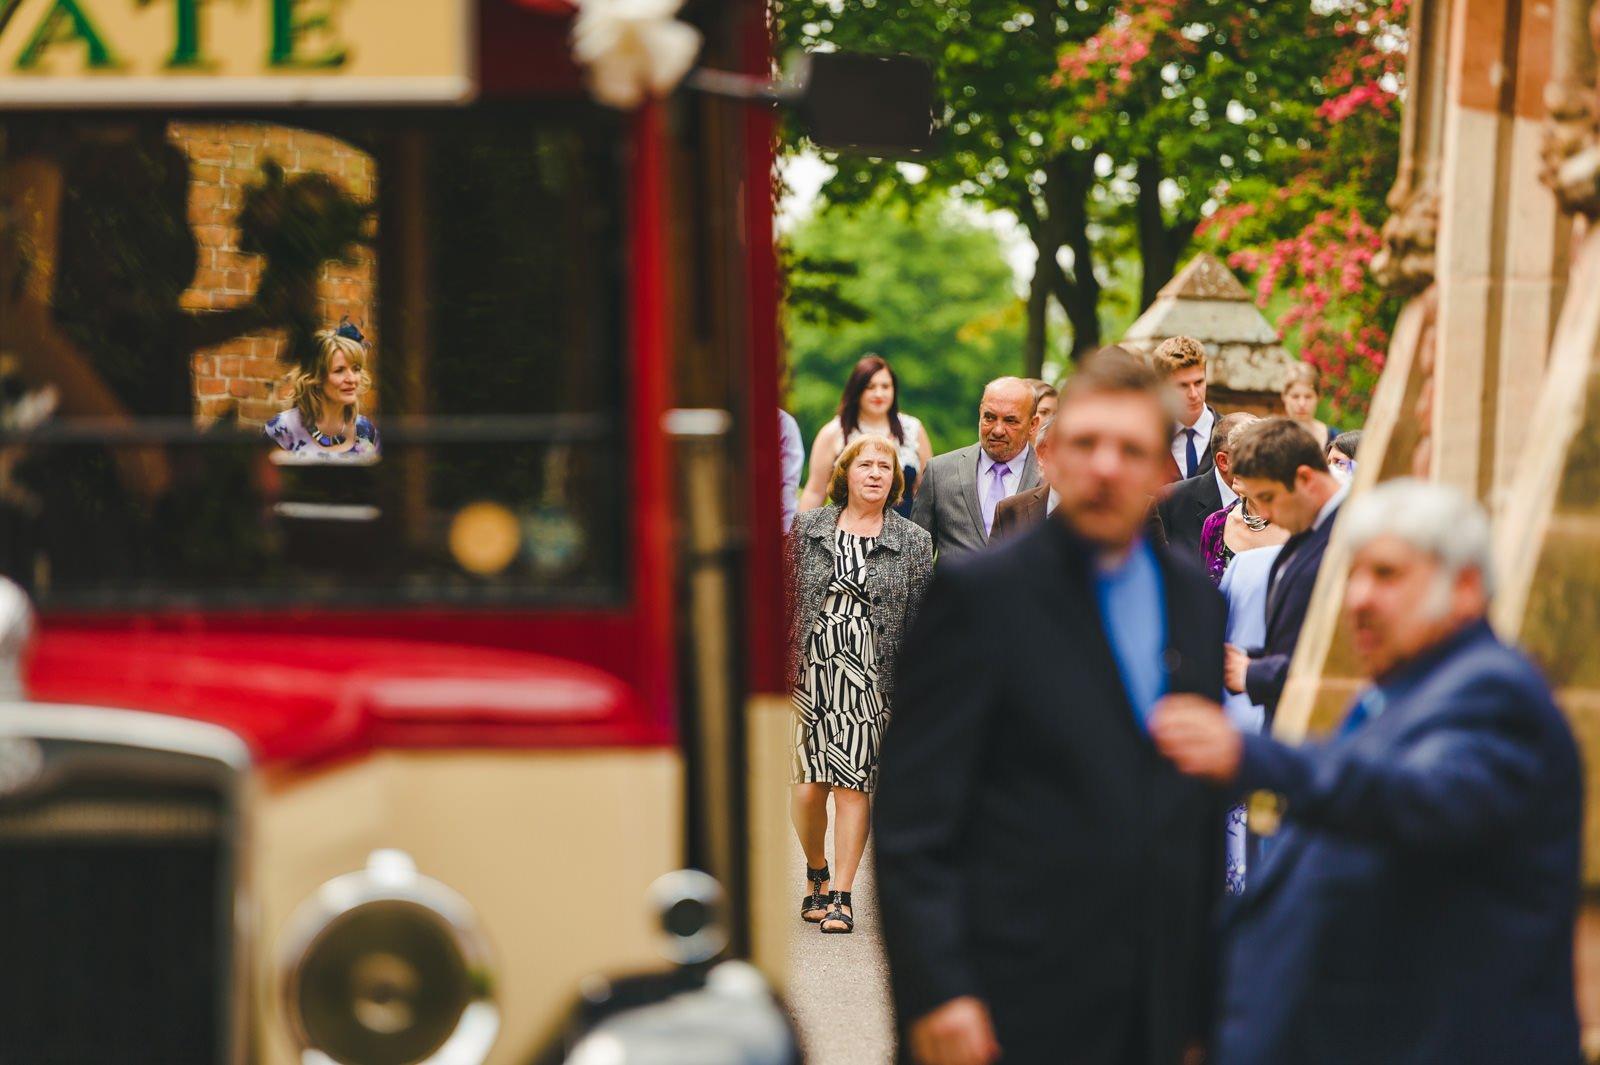 Millers Of Netley wedding, Dorrington, Shrewsbury | Emma + Ben 15